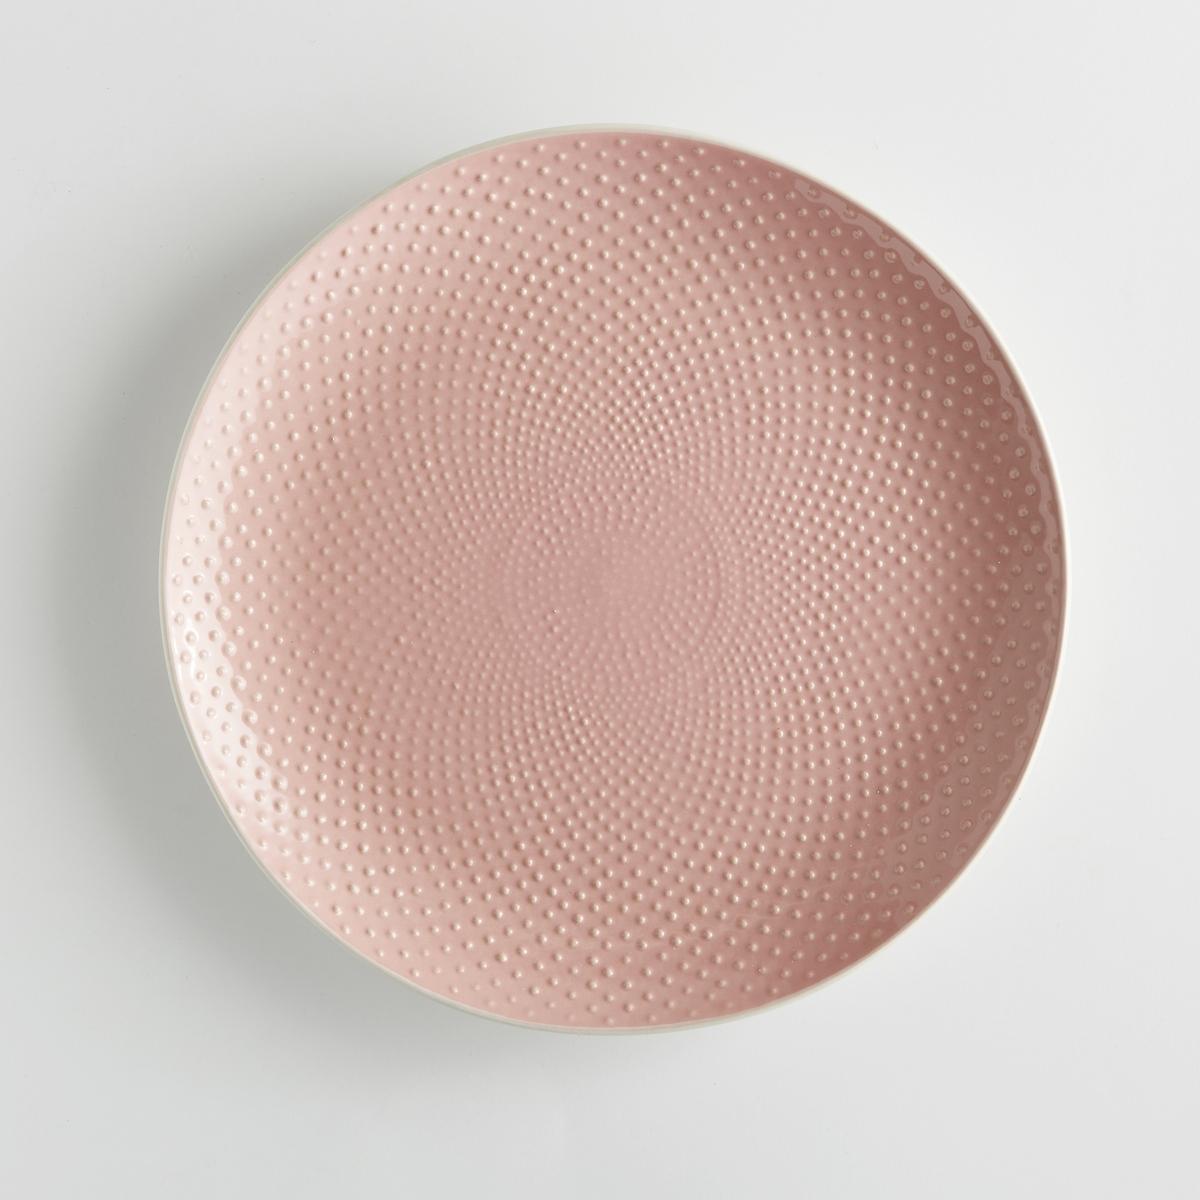 4 тарелки плоские с рисунком в крапинку Arsenia